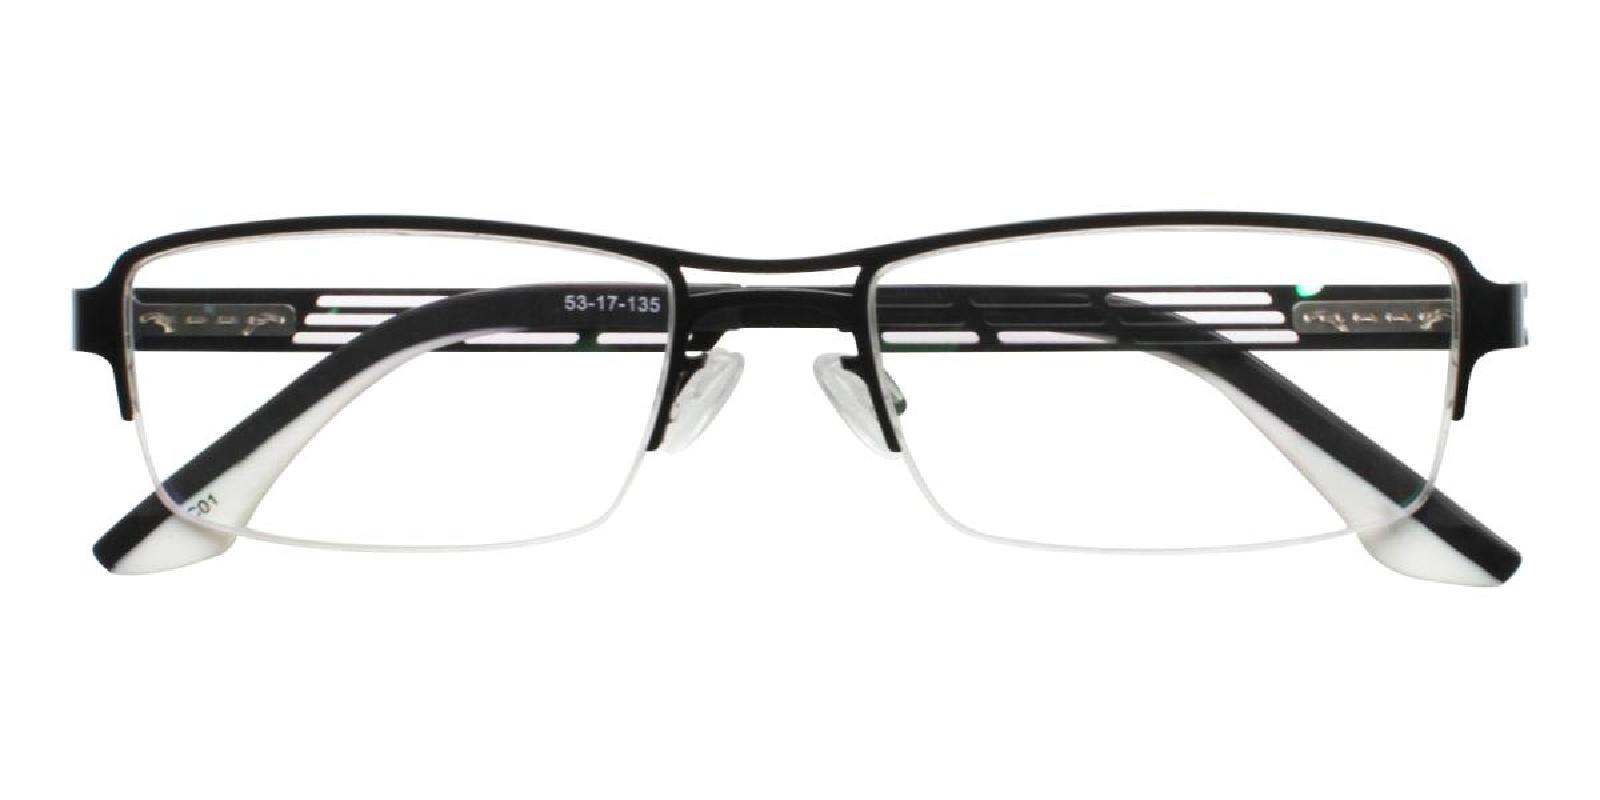 Carel-Black-Rectangle-Metal-Eyeglasses-detail